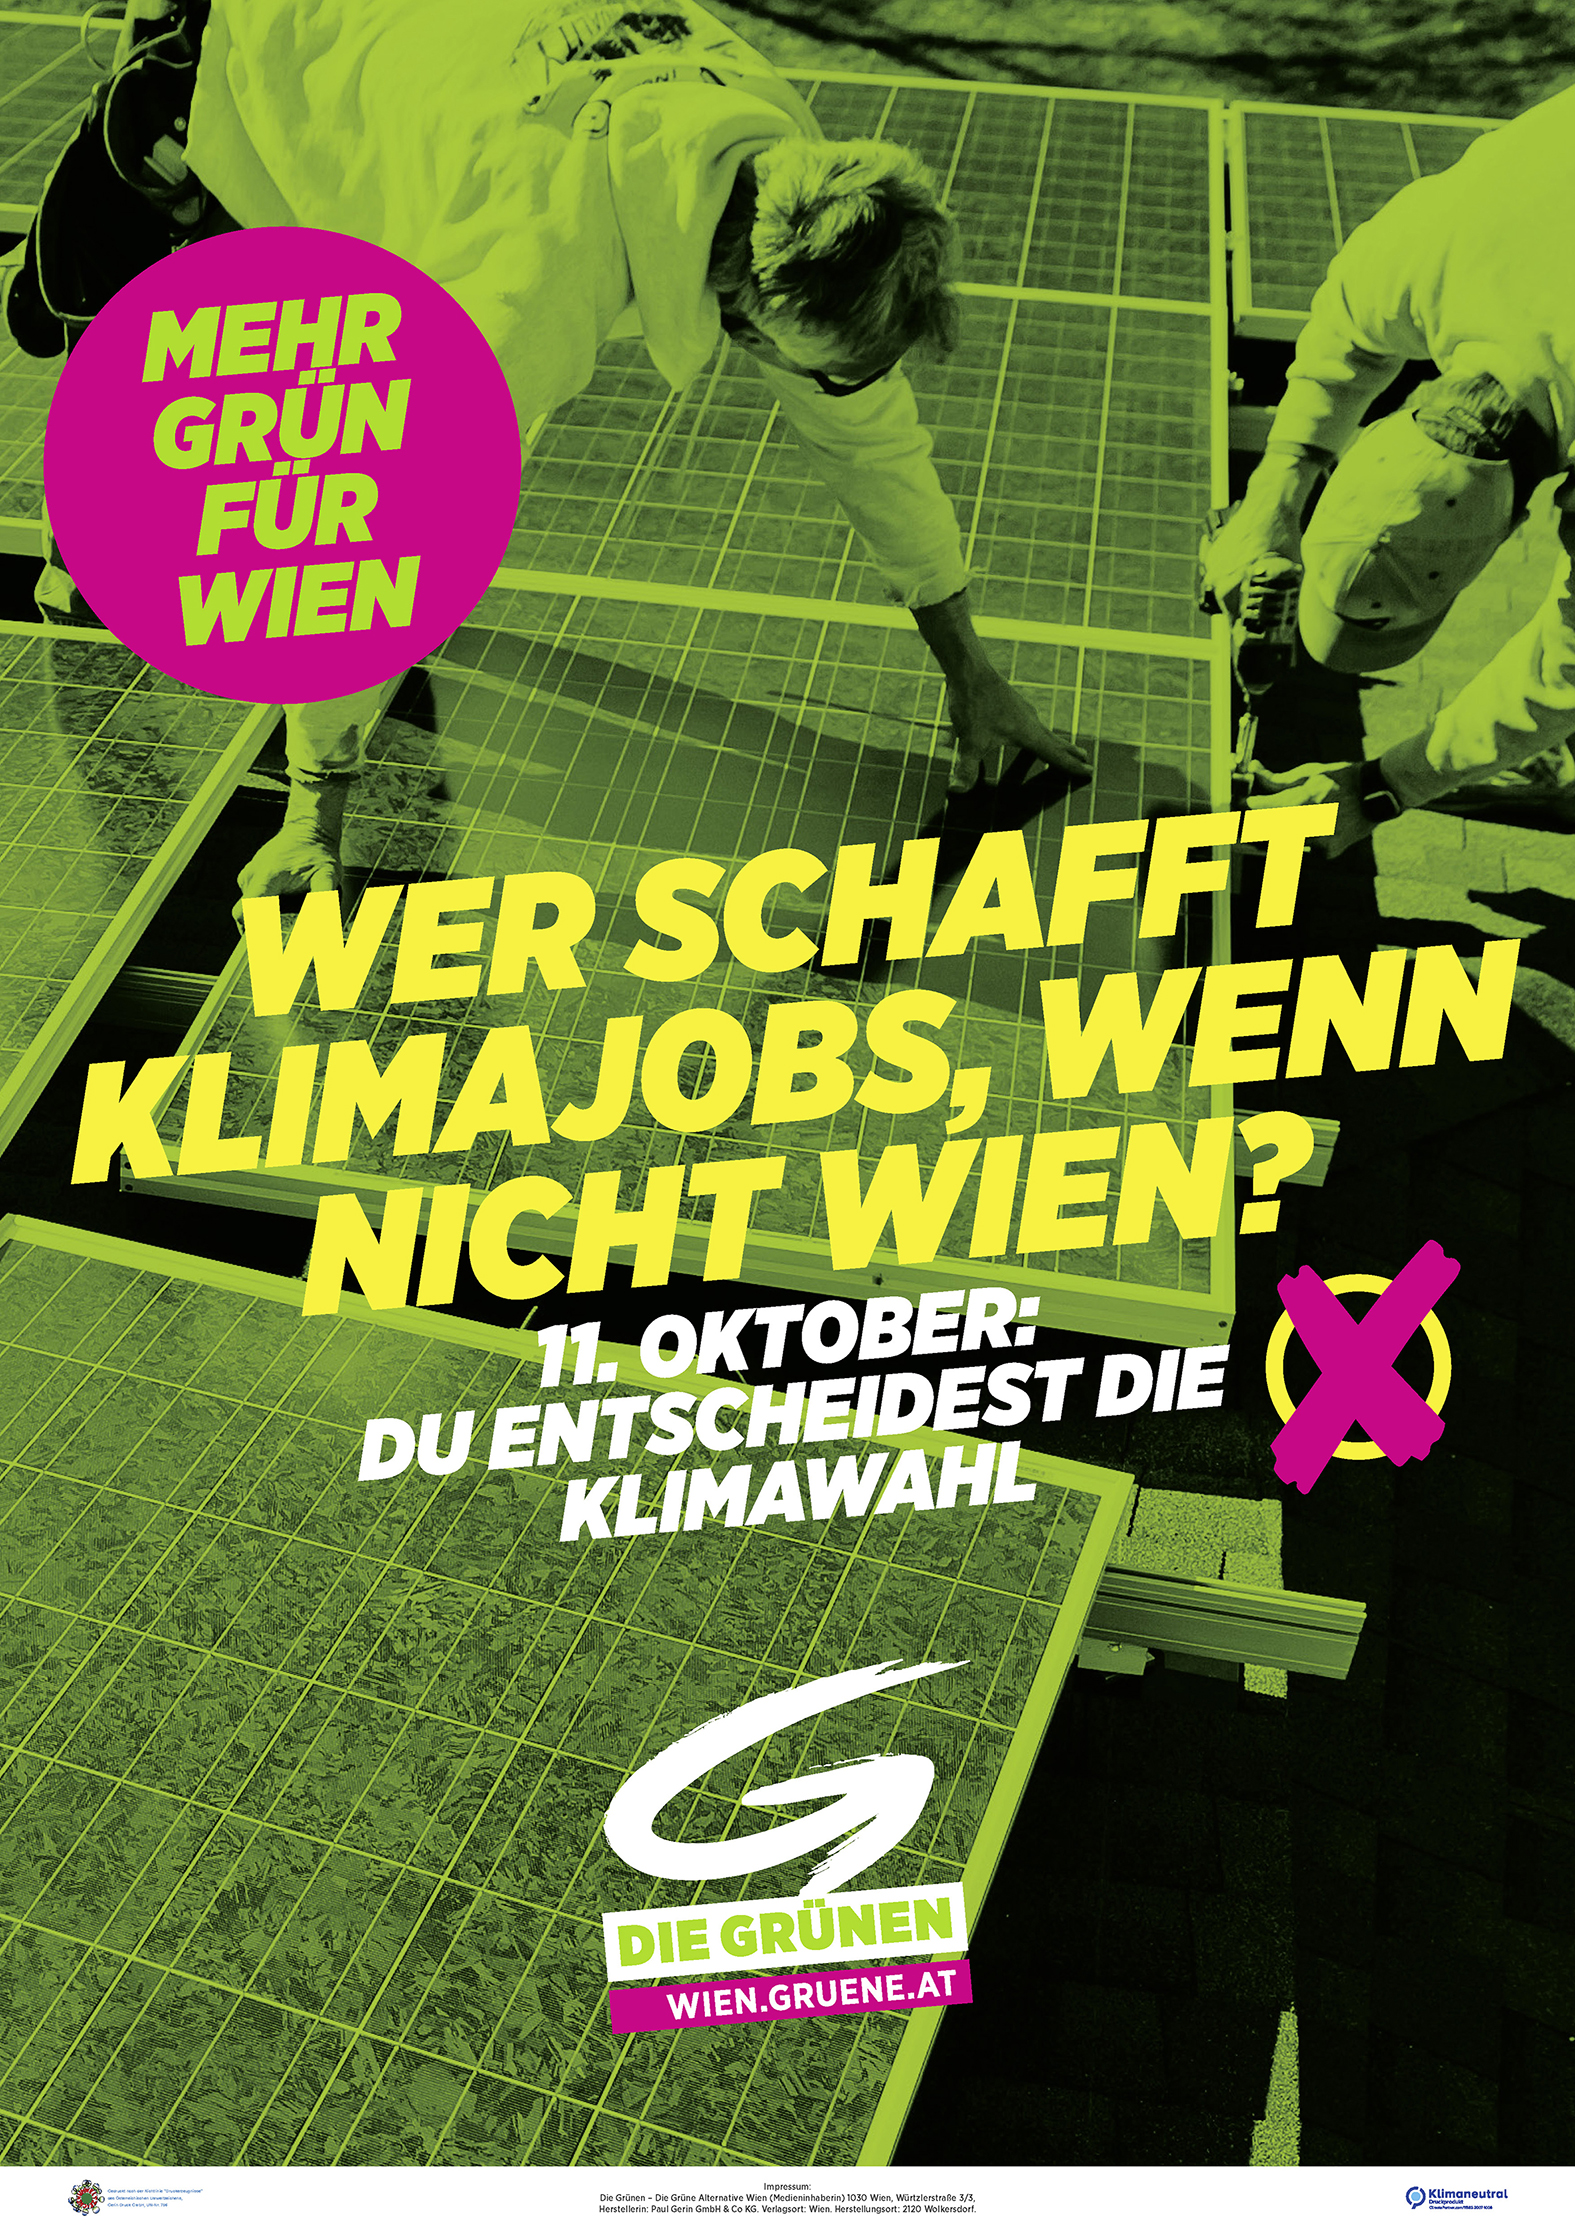 Gruene-Plakate-A3-Klimajobs